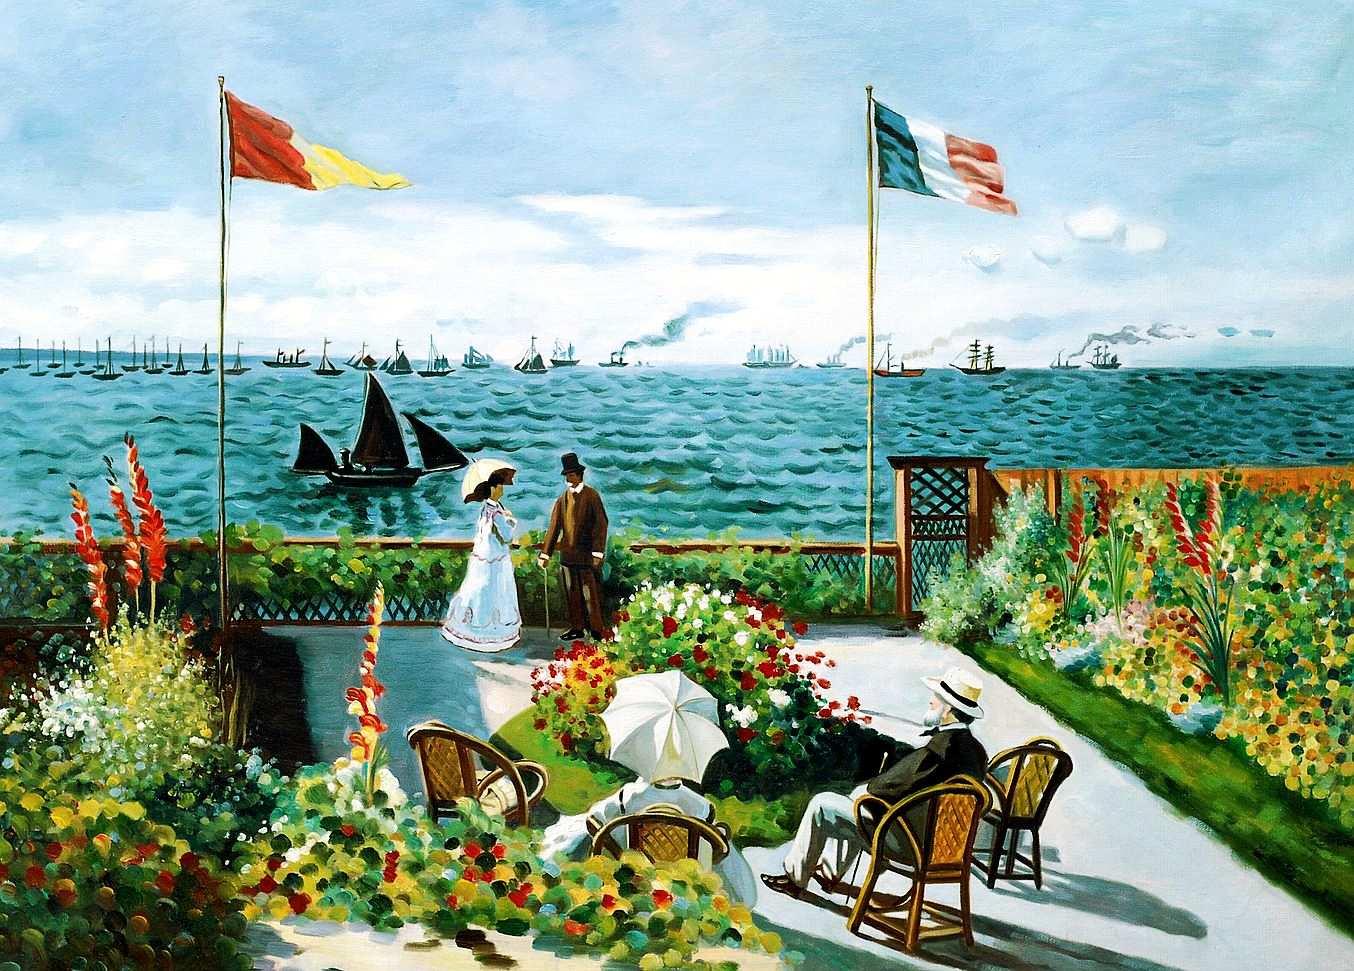 Claude Monet - Terrasse bei Sainte Adresse d95717 60x90cm exquisites Ölgemälde Museumsqualität